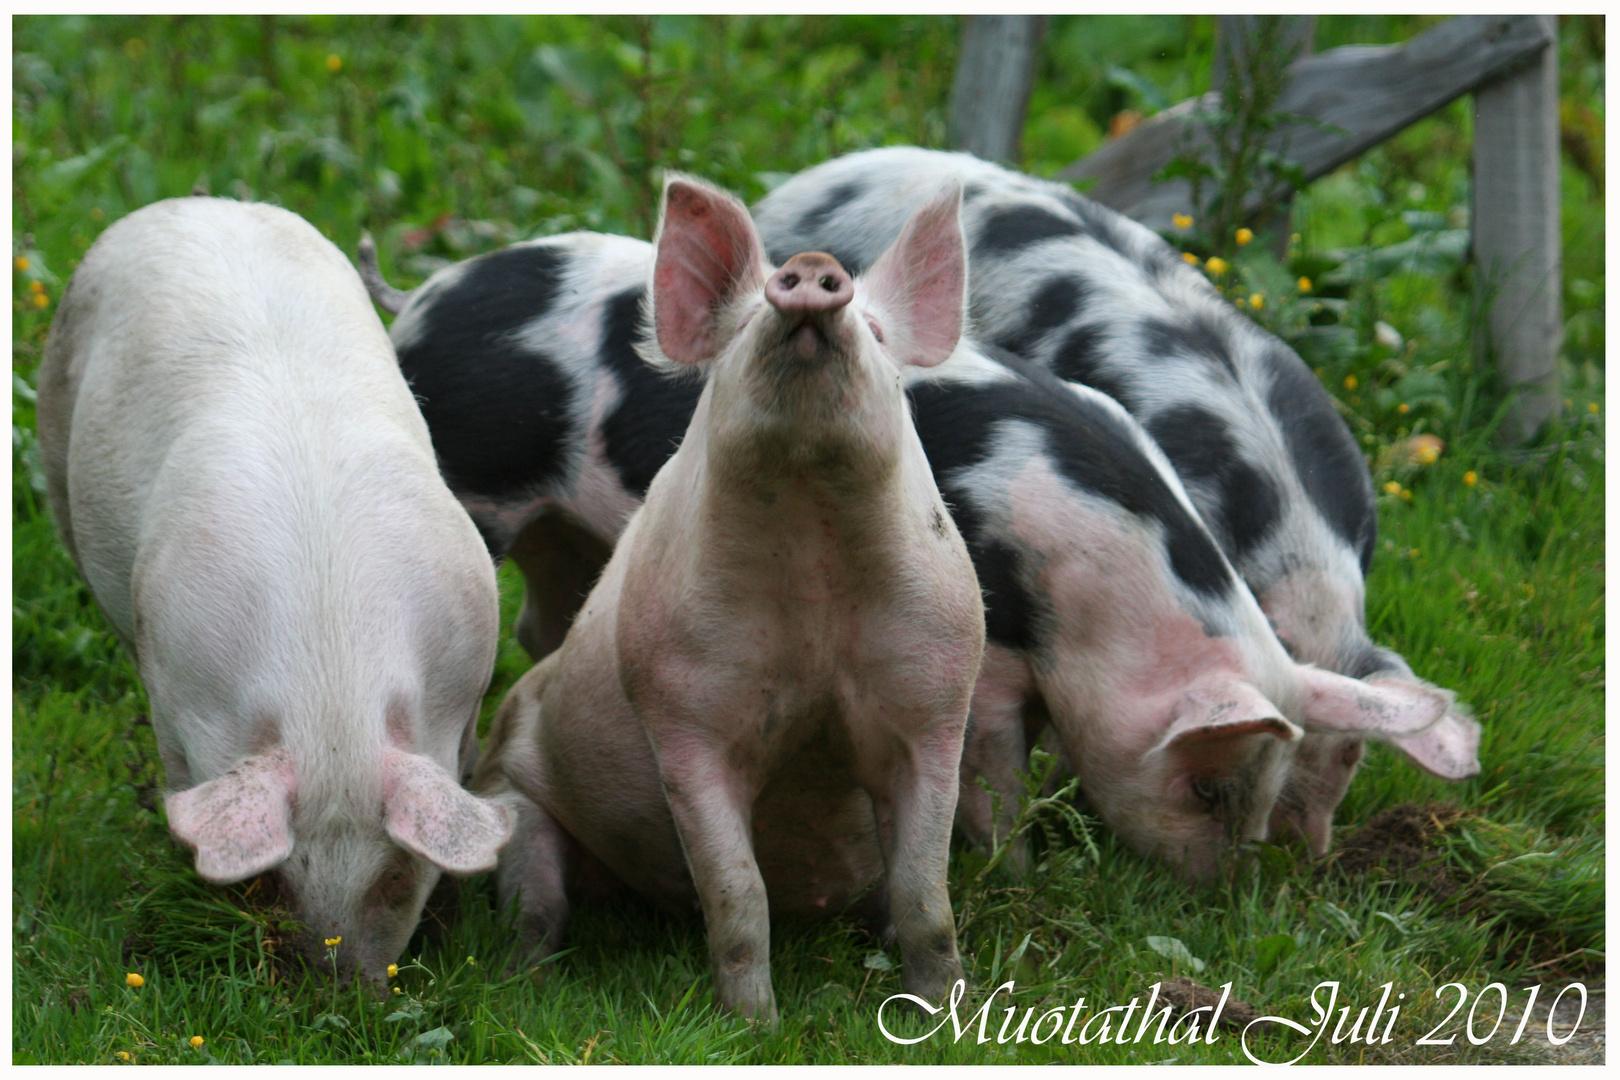 posing pig